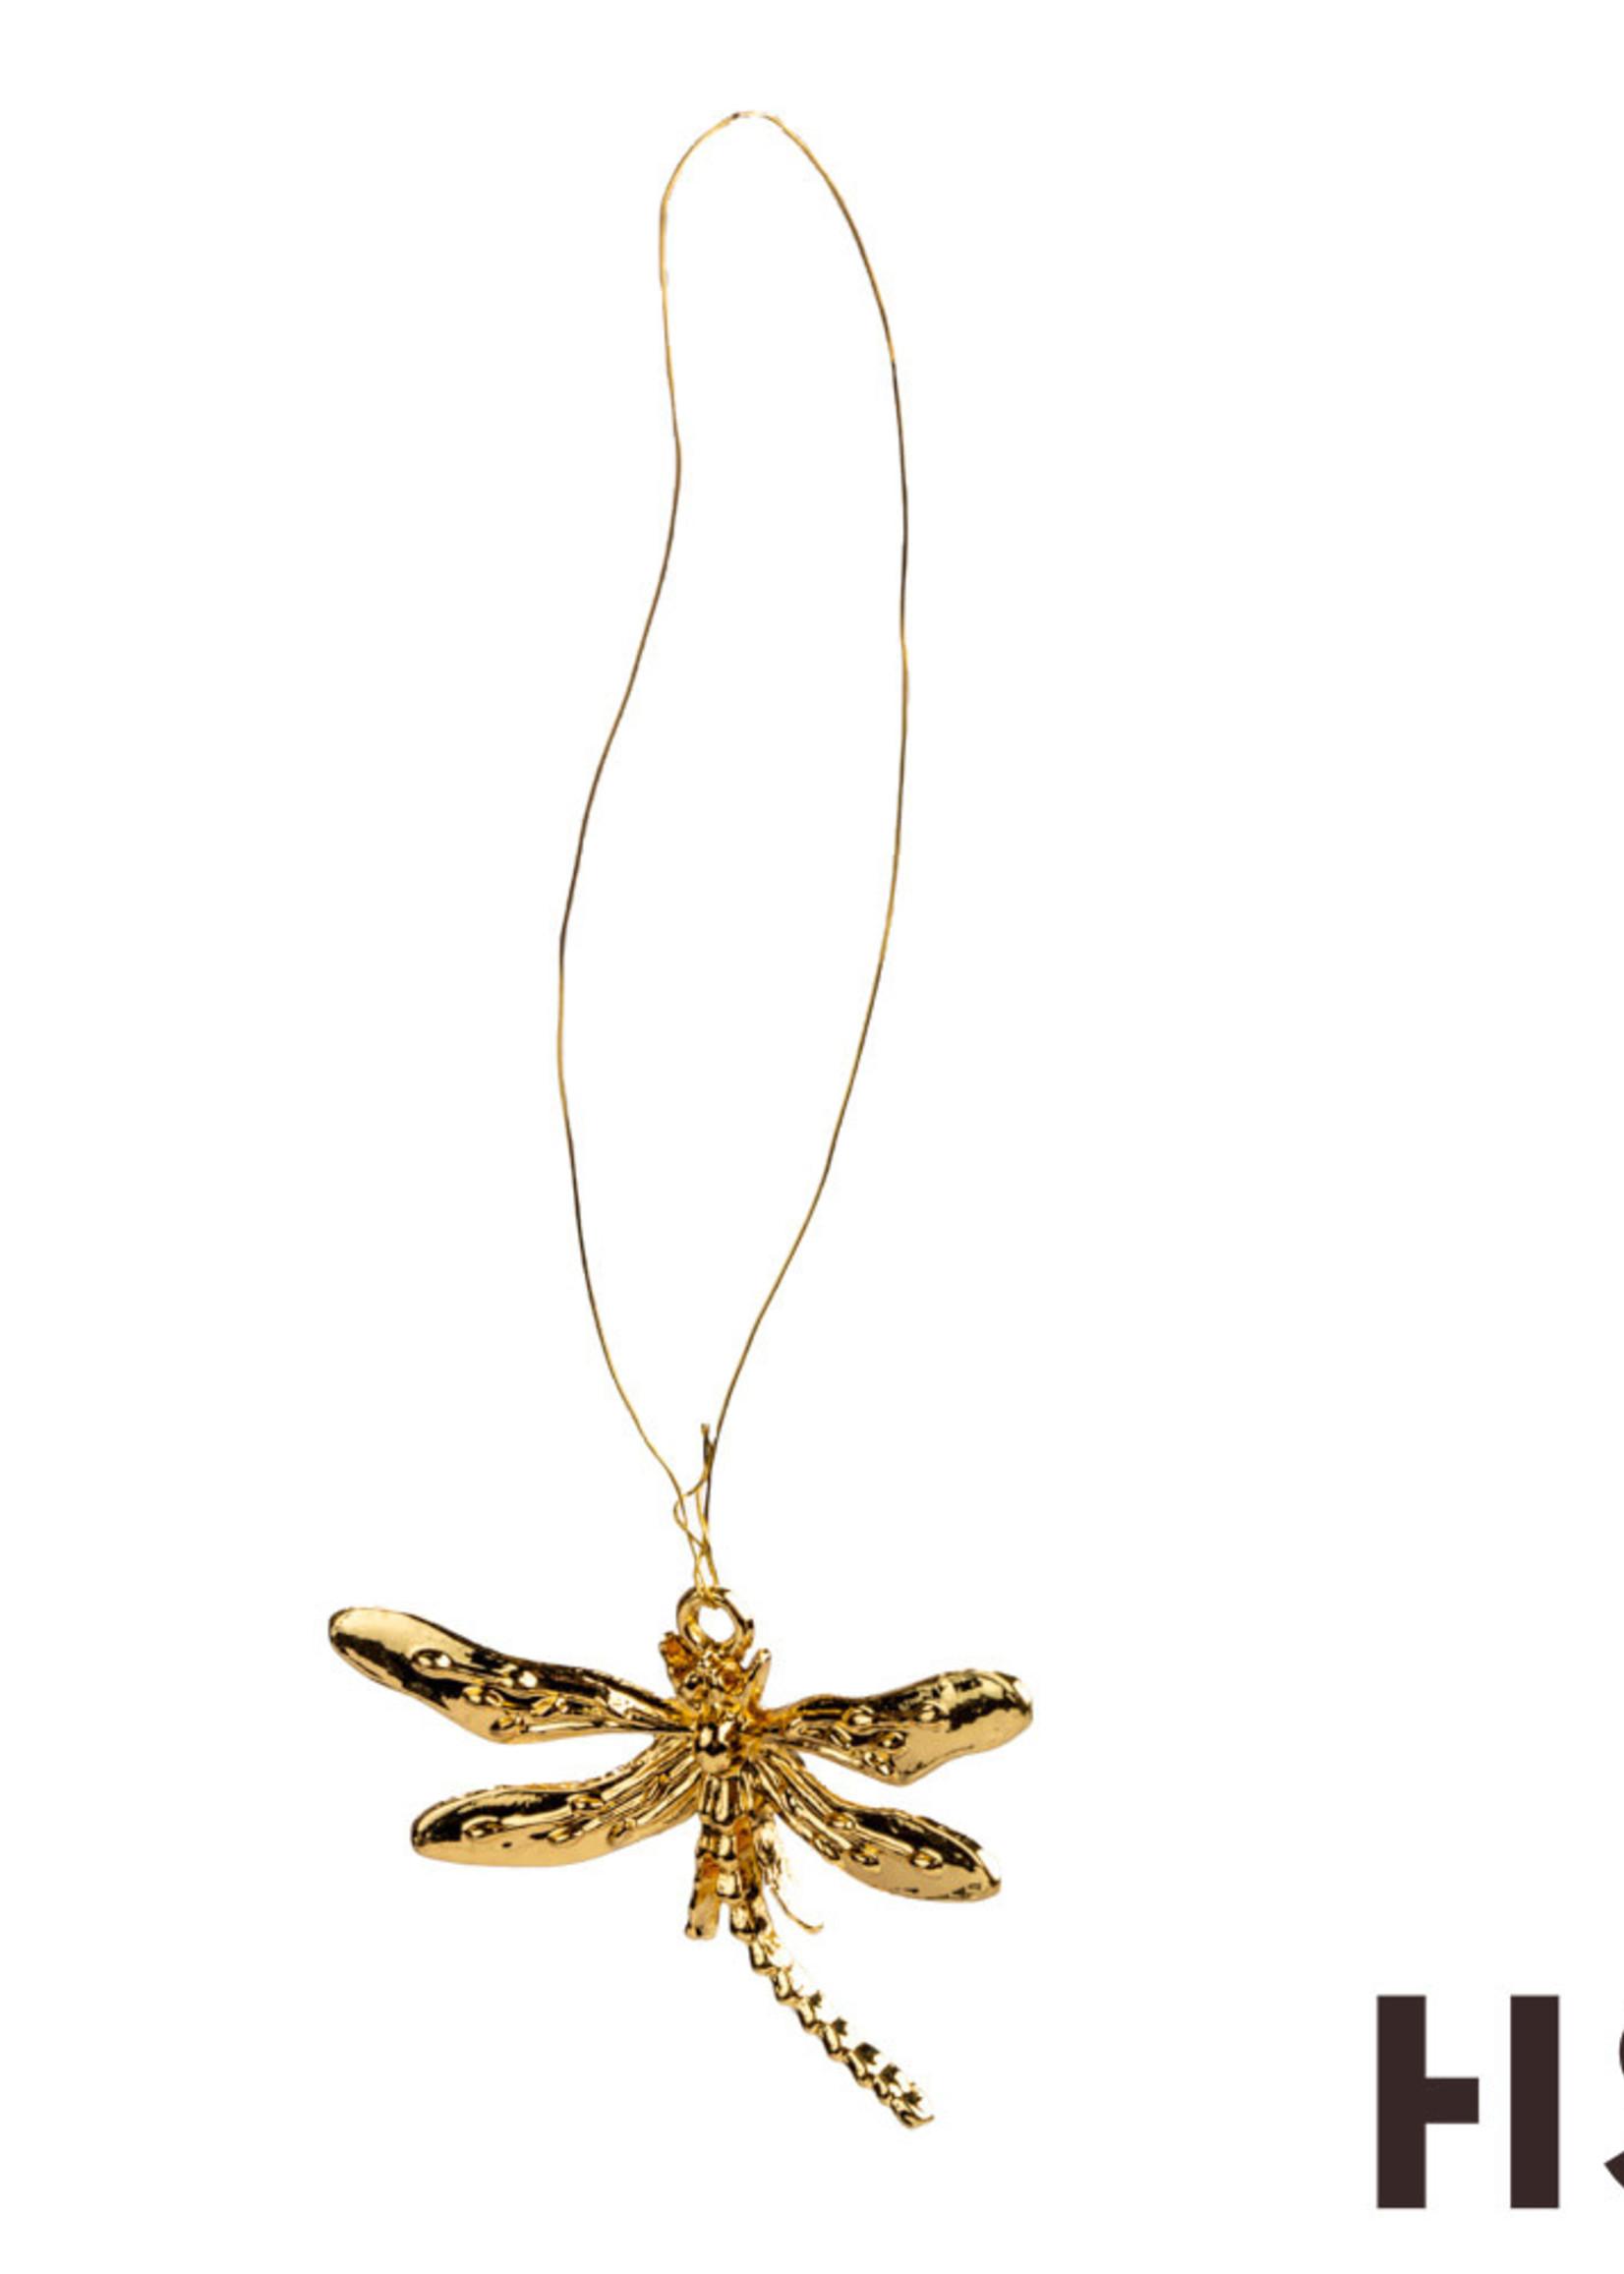 Deco Dragonfly